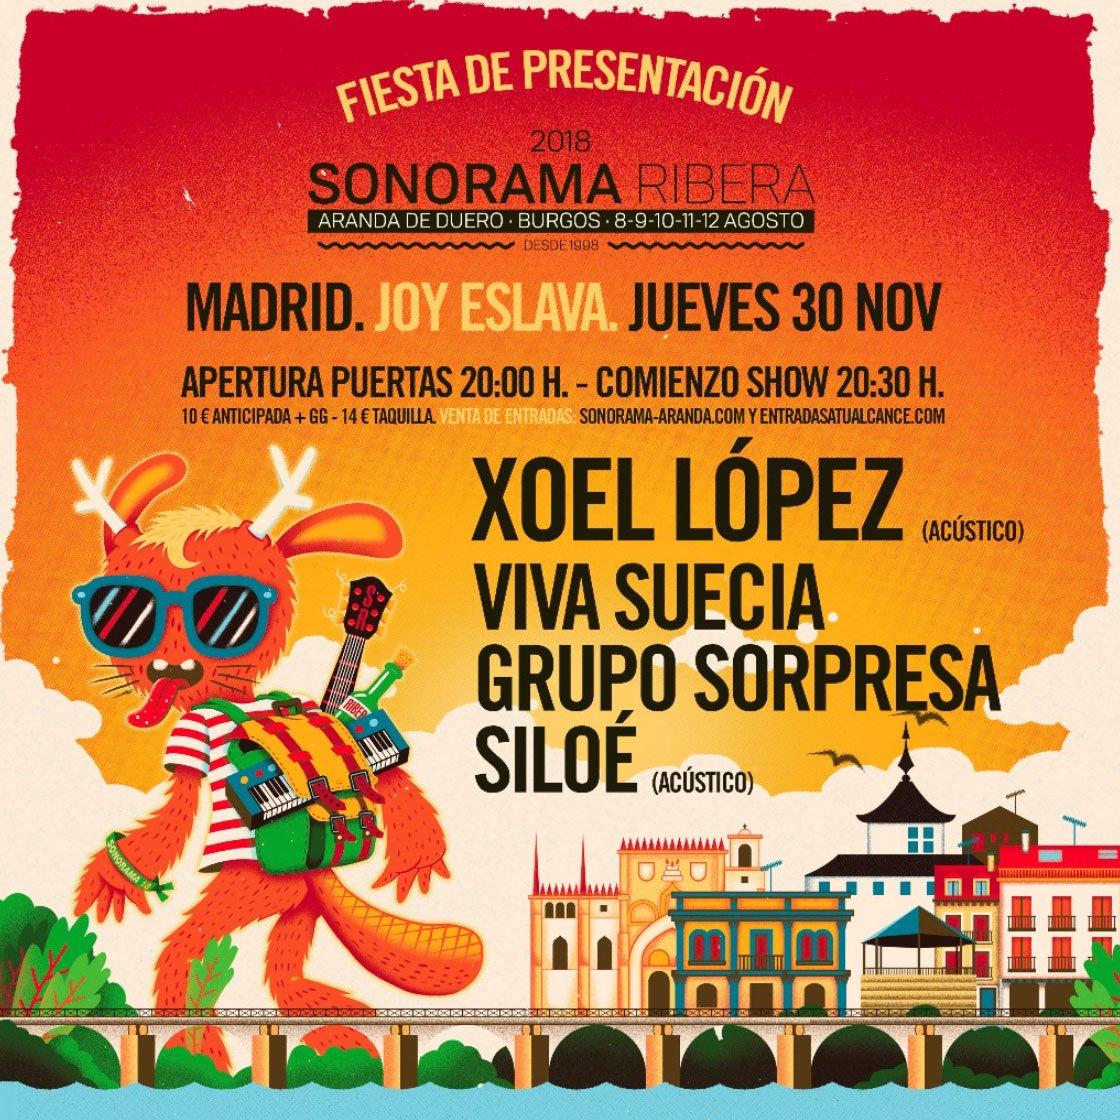 Sonorama 2019 - Página 7 DNY0O6kX4AEPj3X